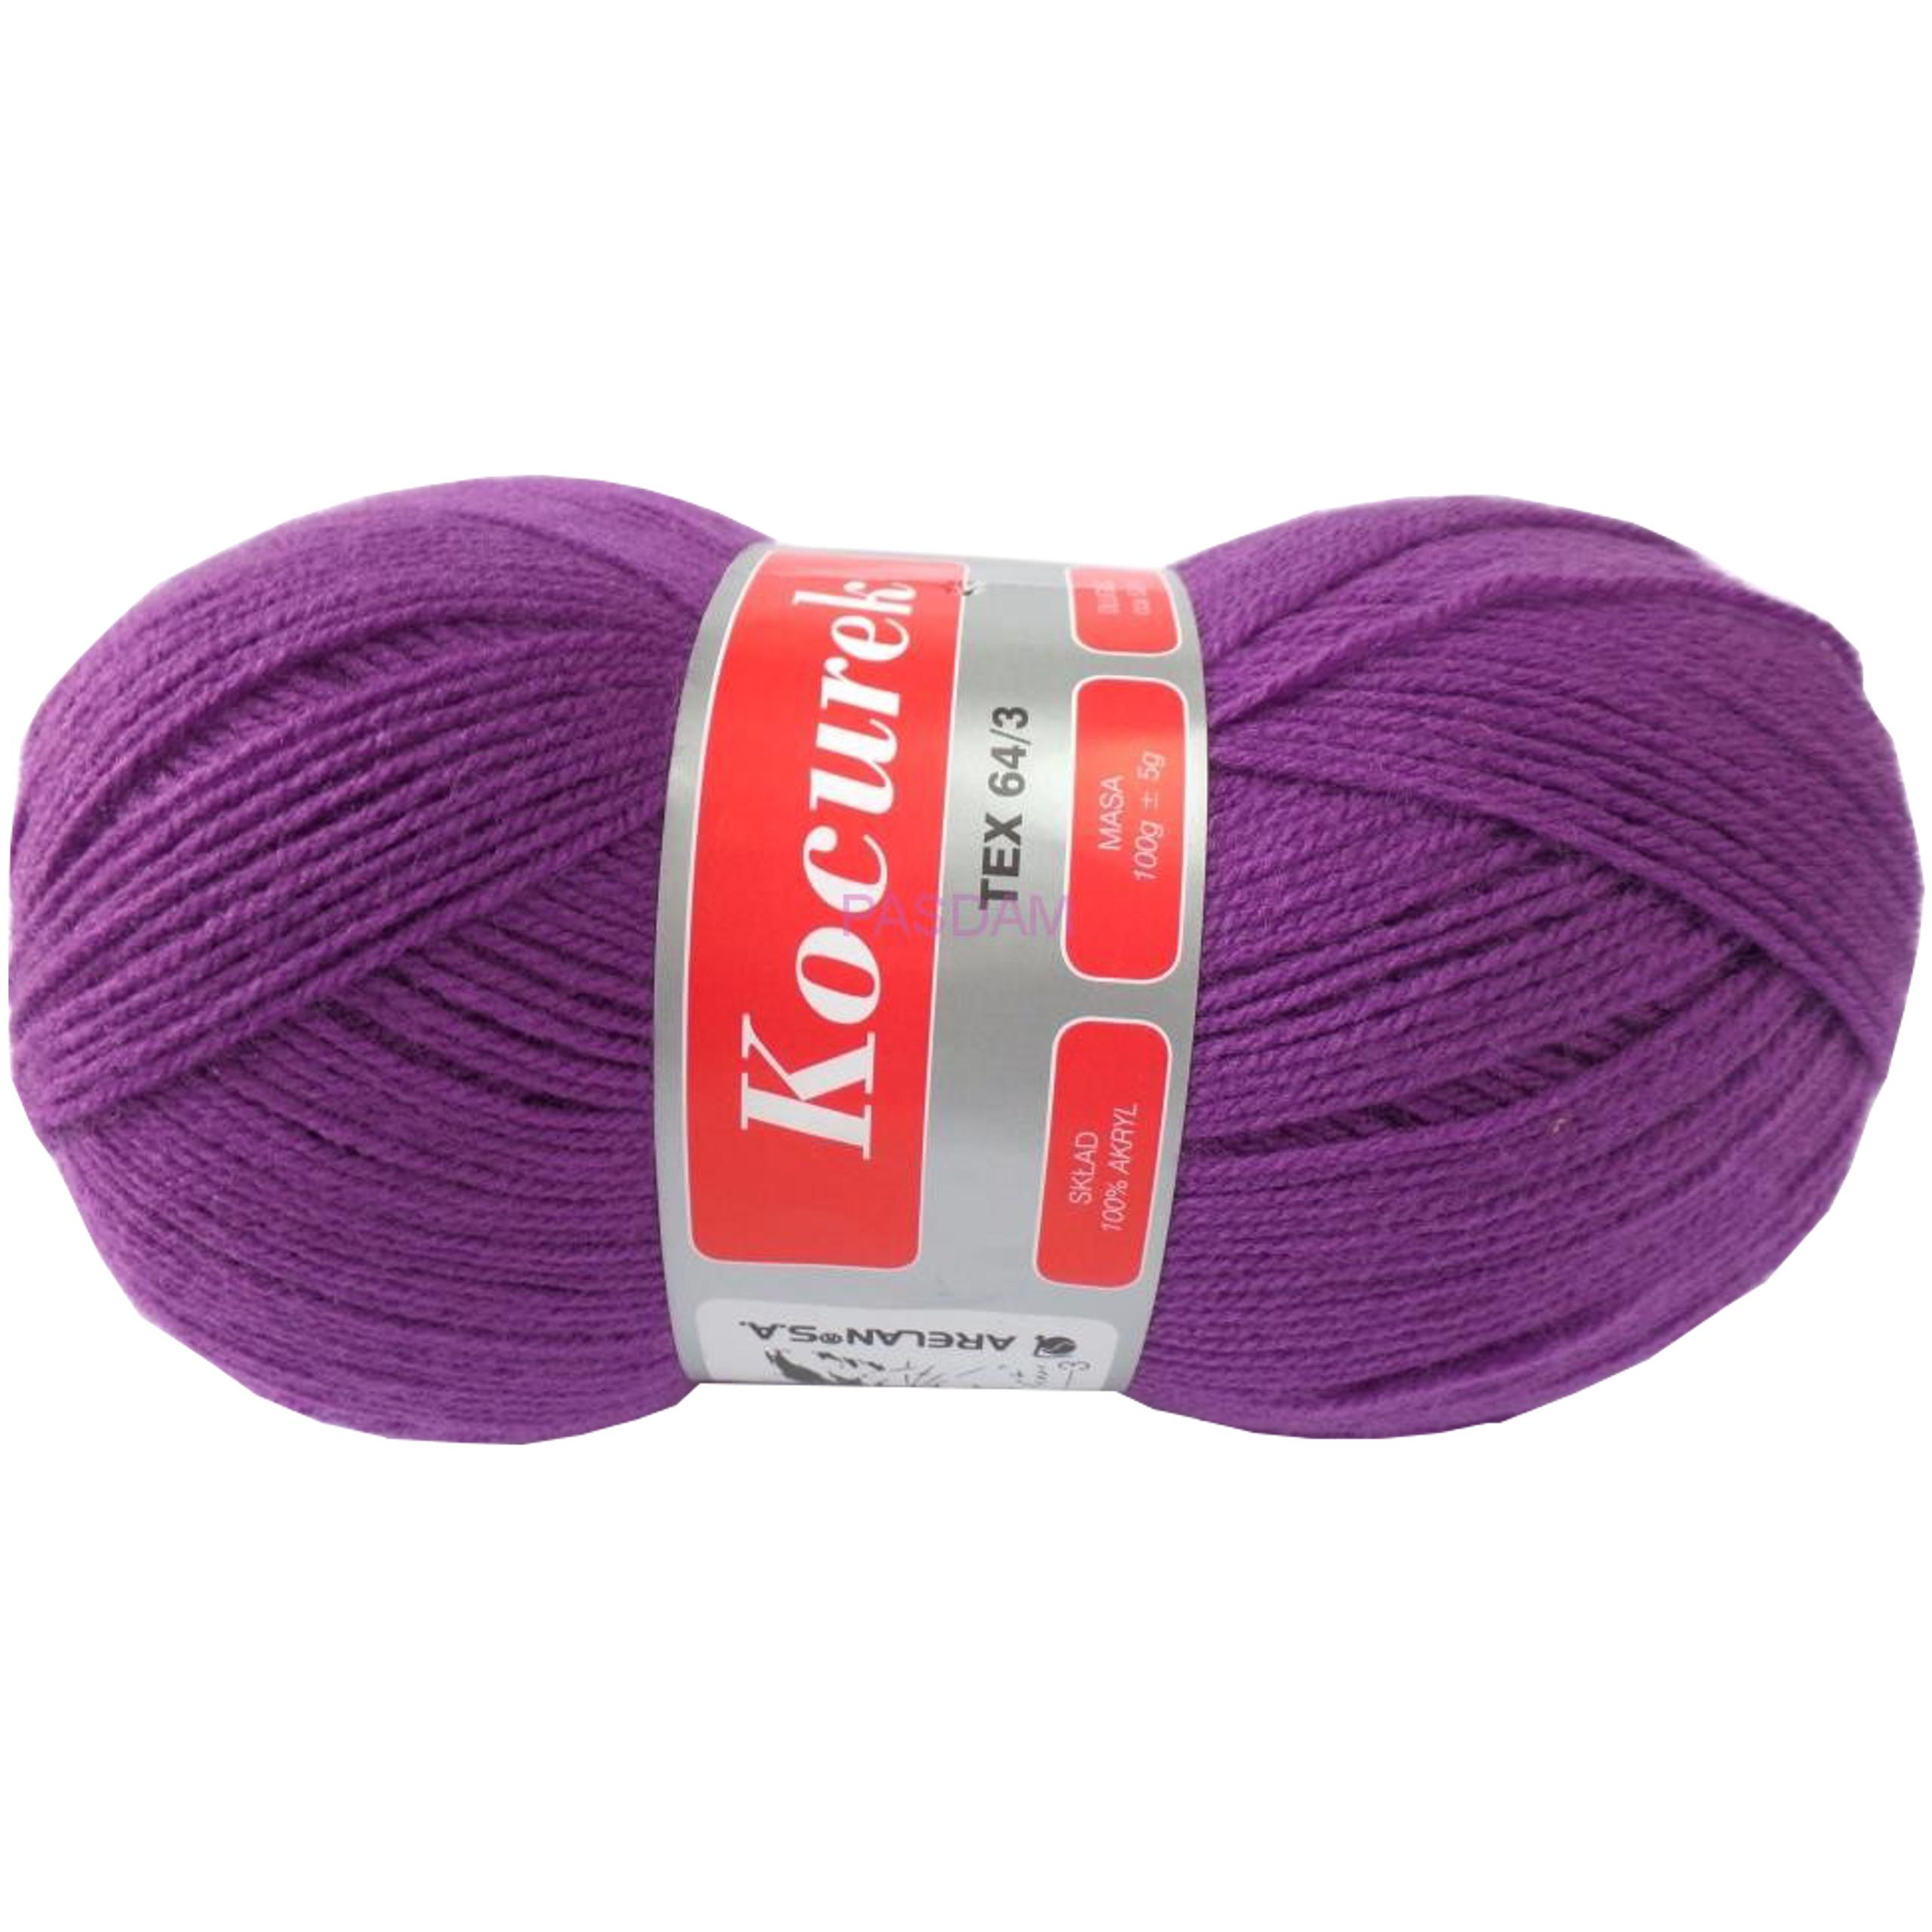 Item Internet-KOCUREK - Arelan -100% Acrylic -Many colors